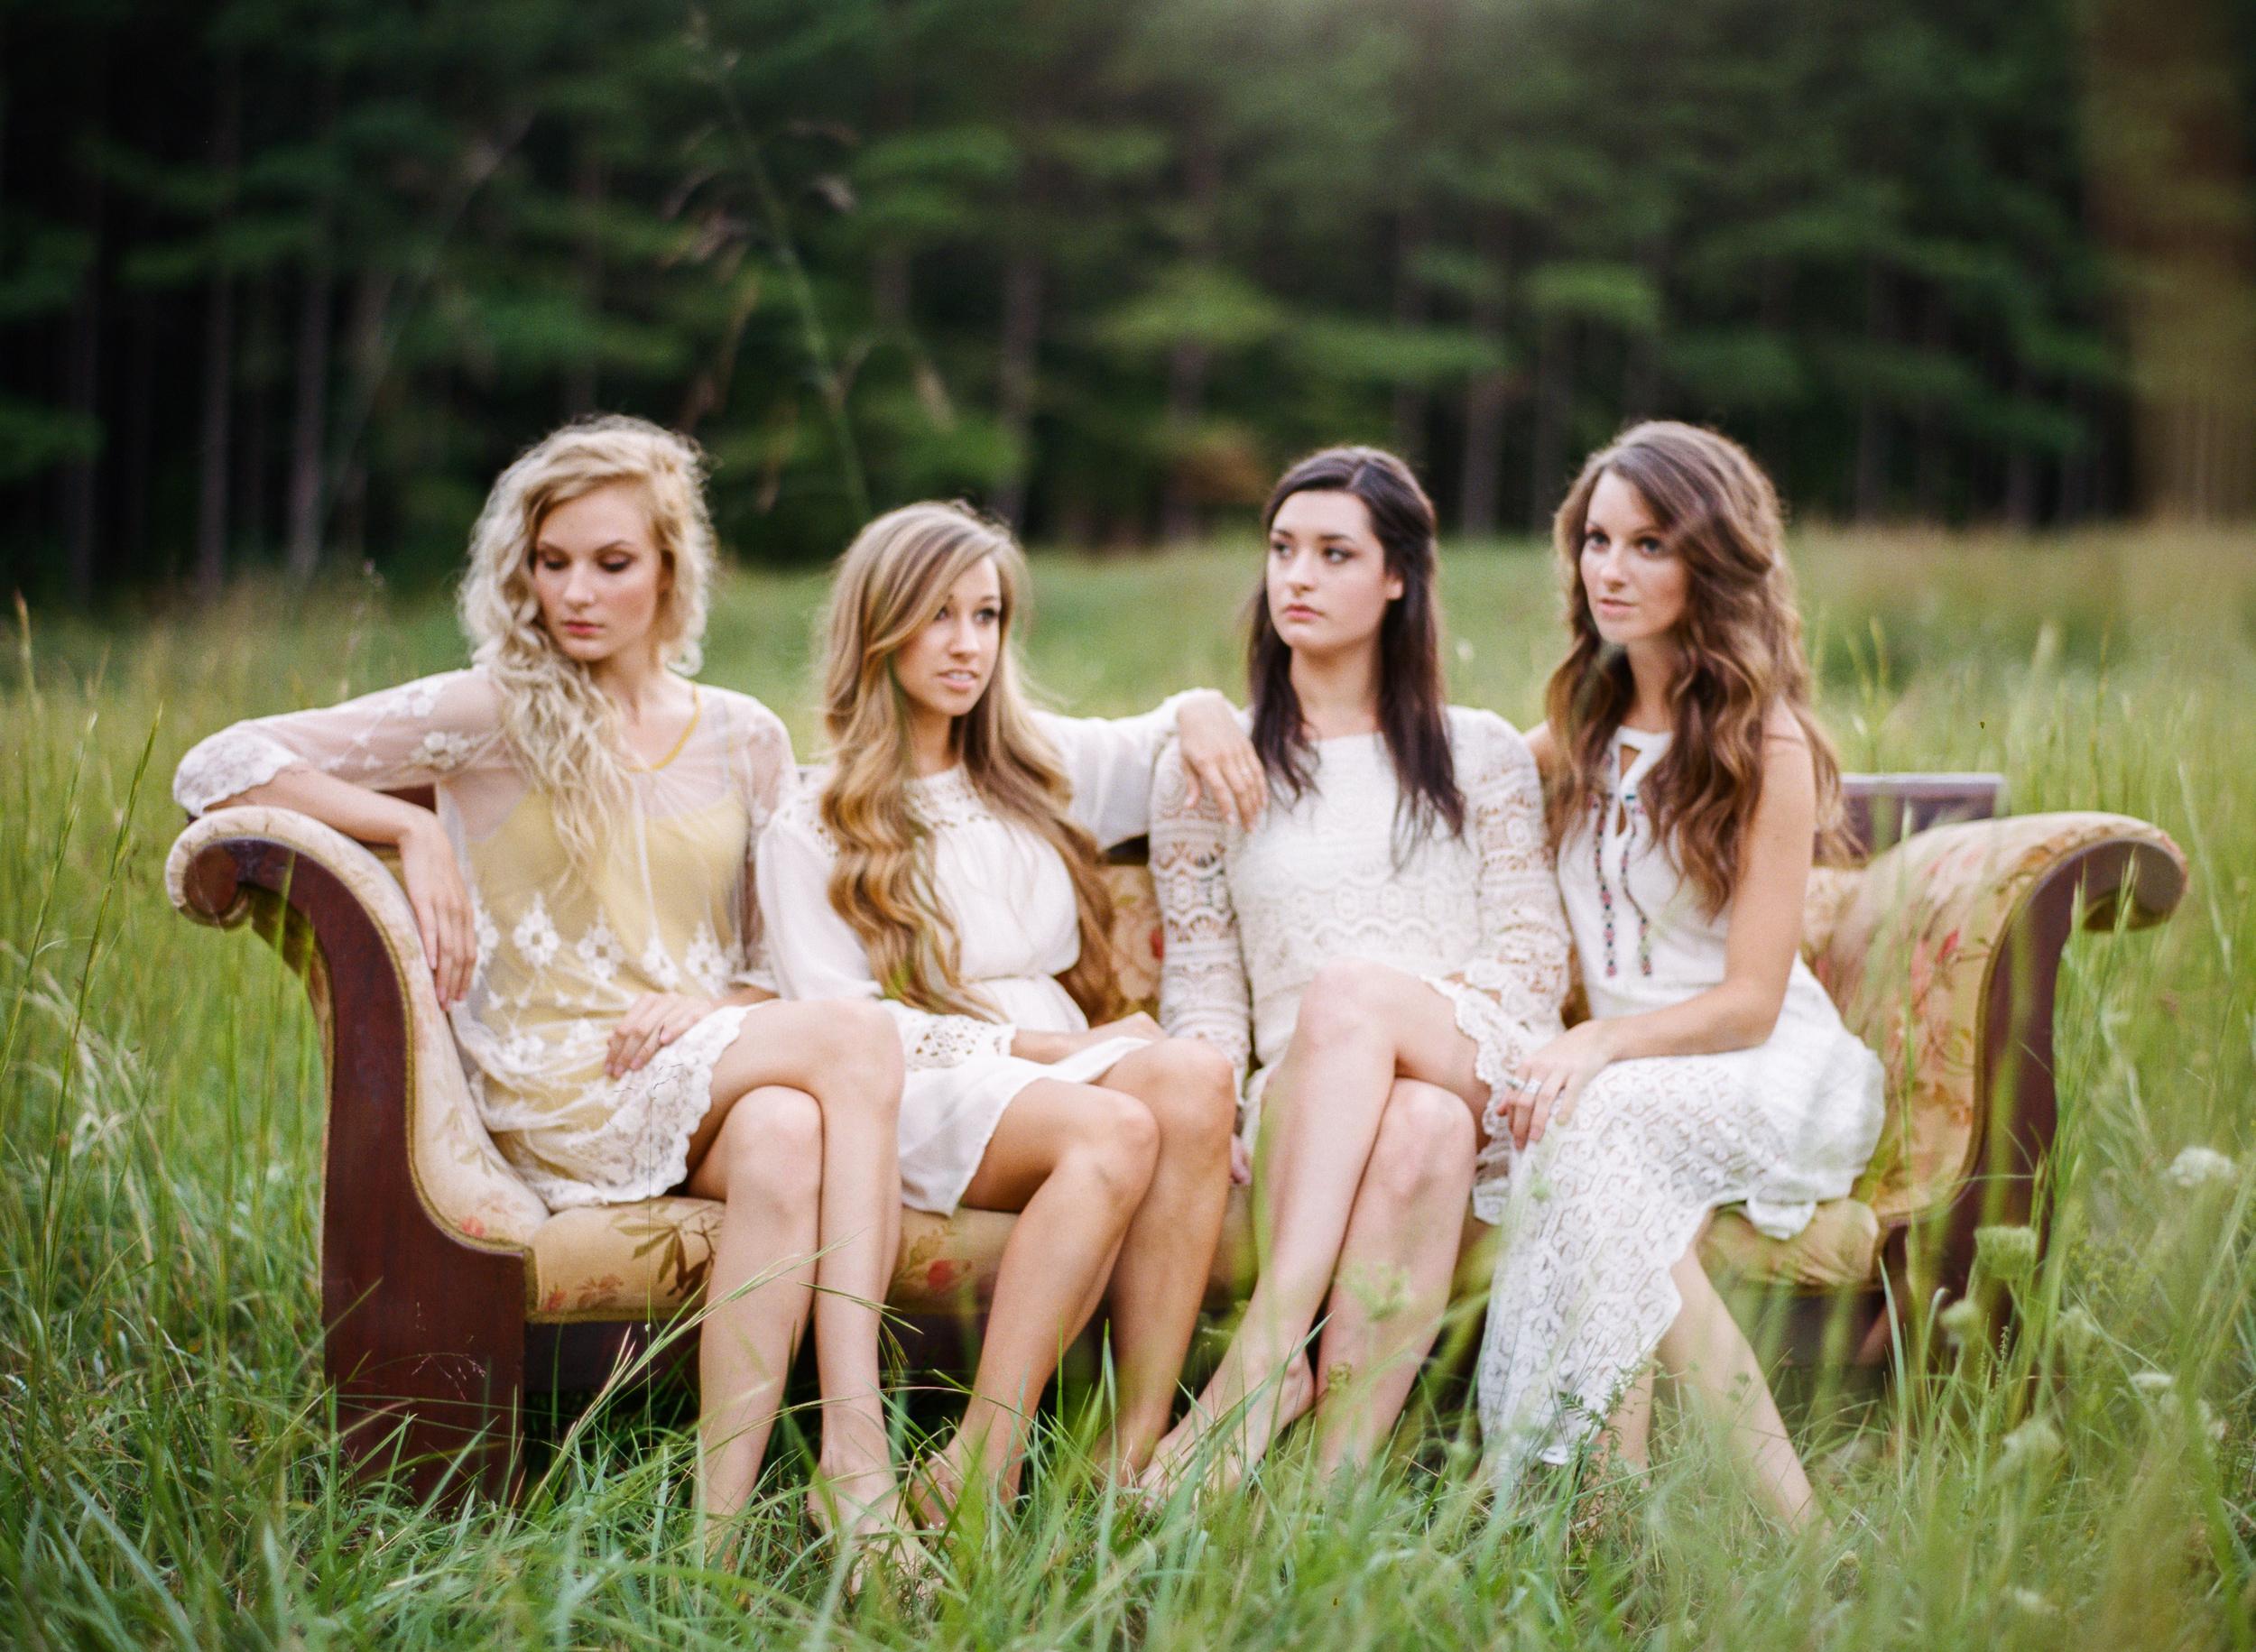 Gladiola girls_Editorial_lookbook_fall_fashion_Zachary Taylor_Fine_Art_Wedding_Photographer-6.jpg